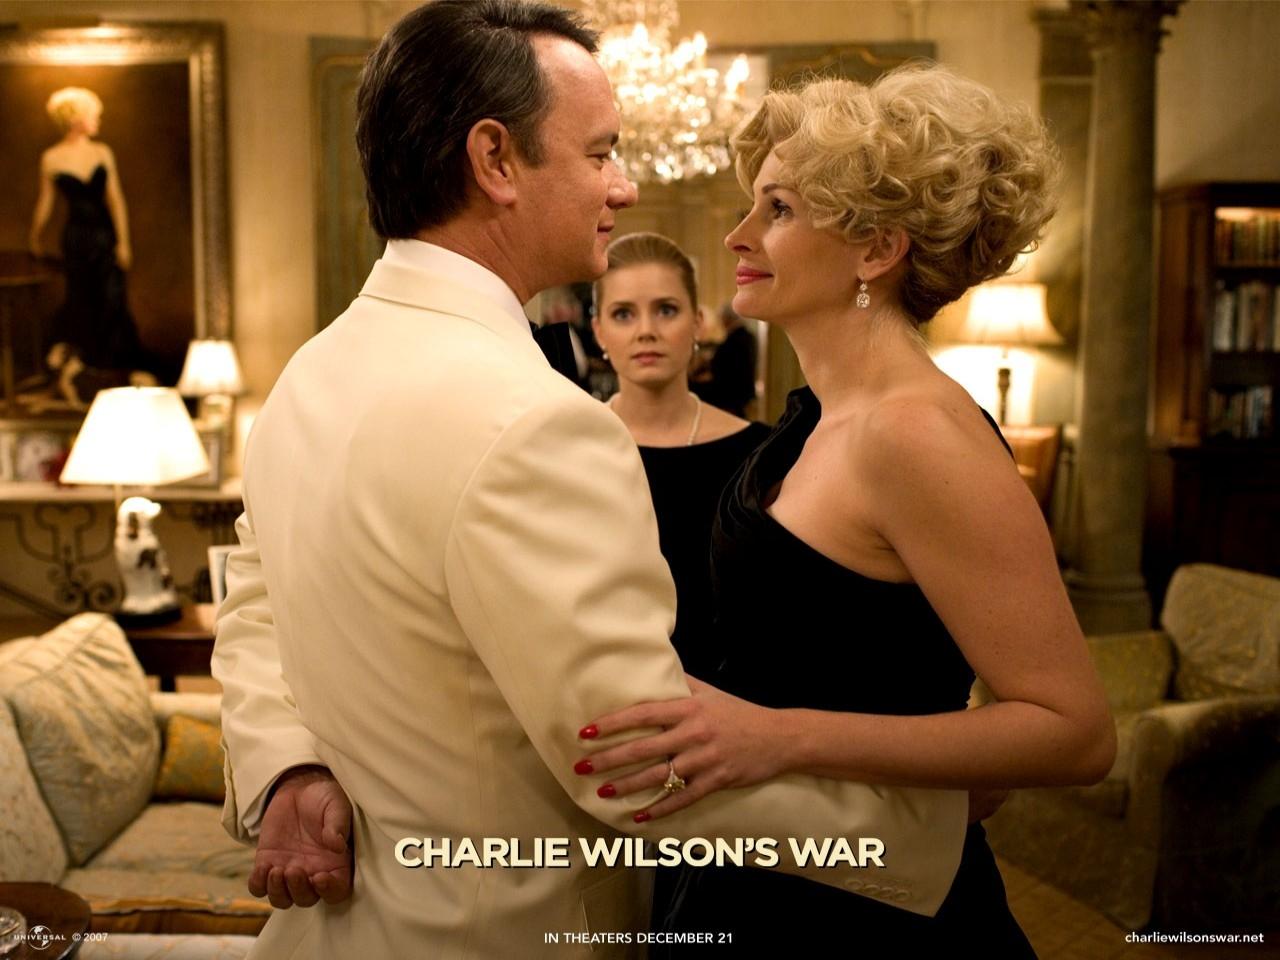 Wallpaper del film La guerra di Charlie Wilson con Hanks e la Roberts